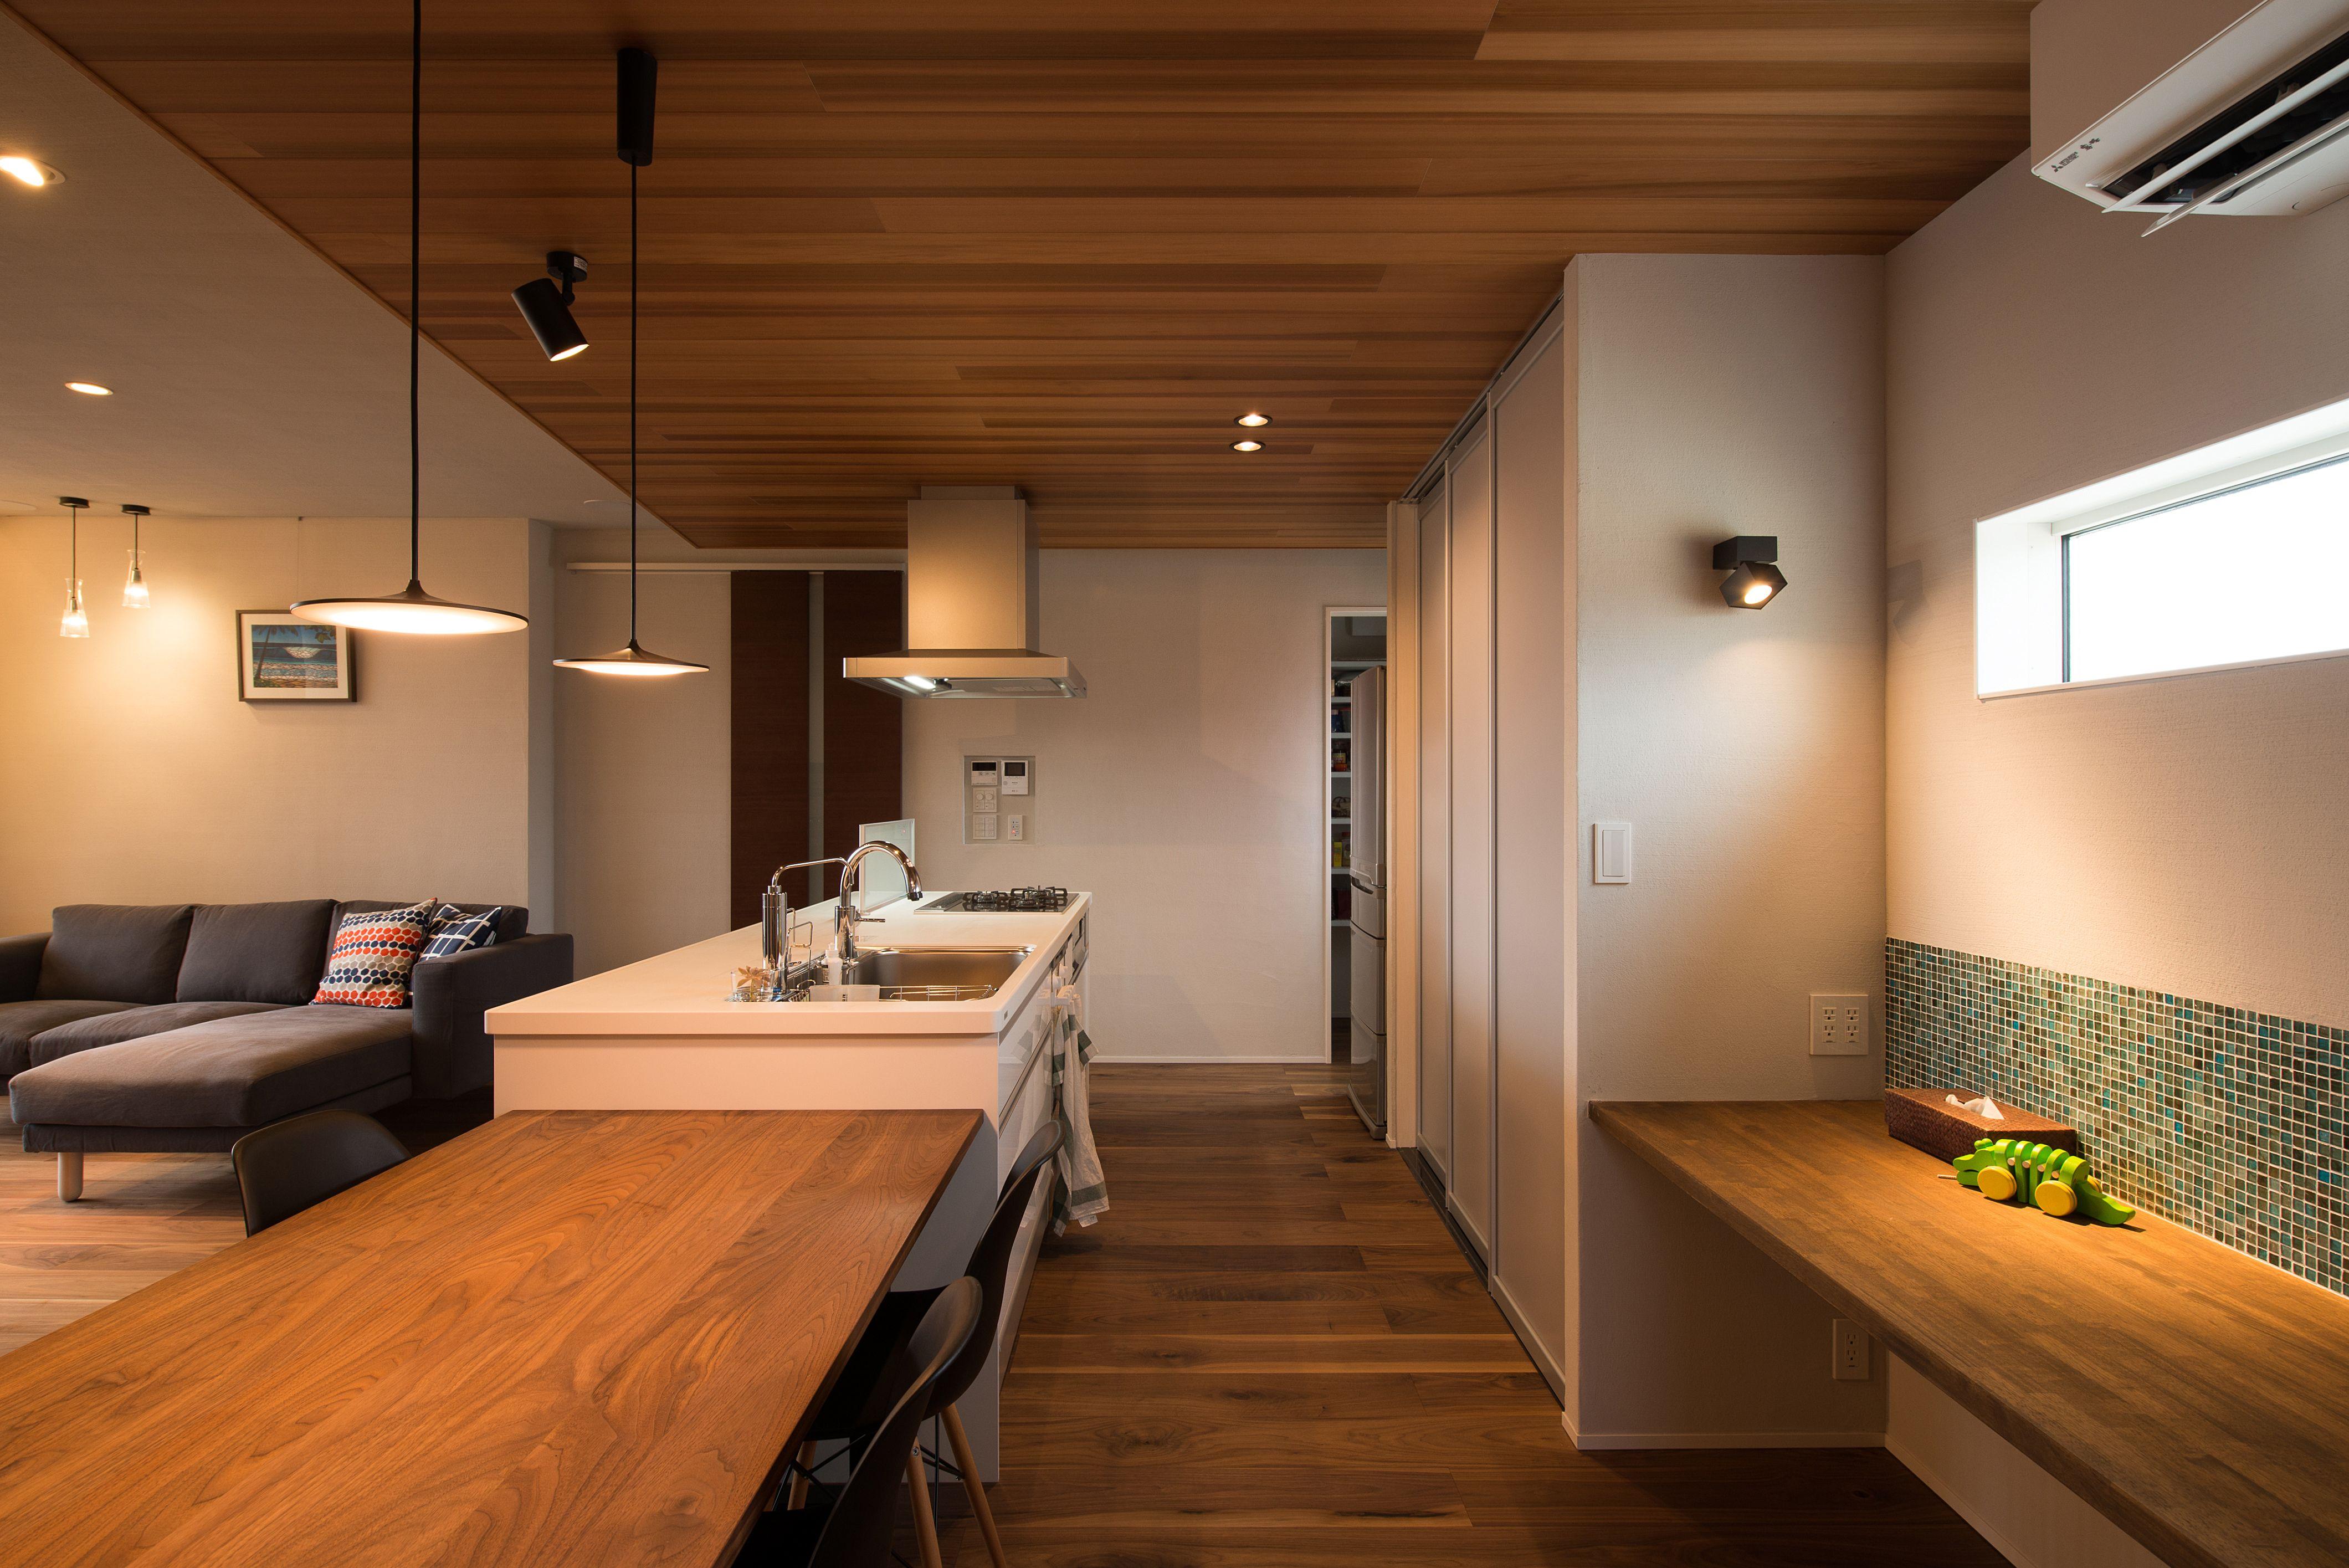 Ue Bo Design ウエボデザイン 注文住宅 施工事例 キッチン